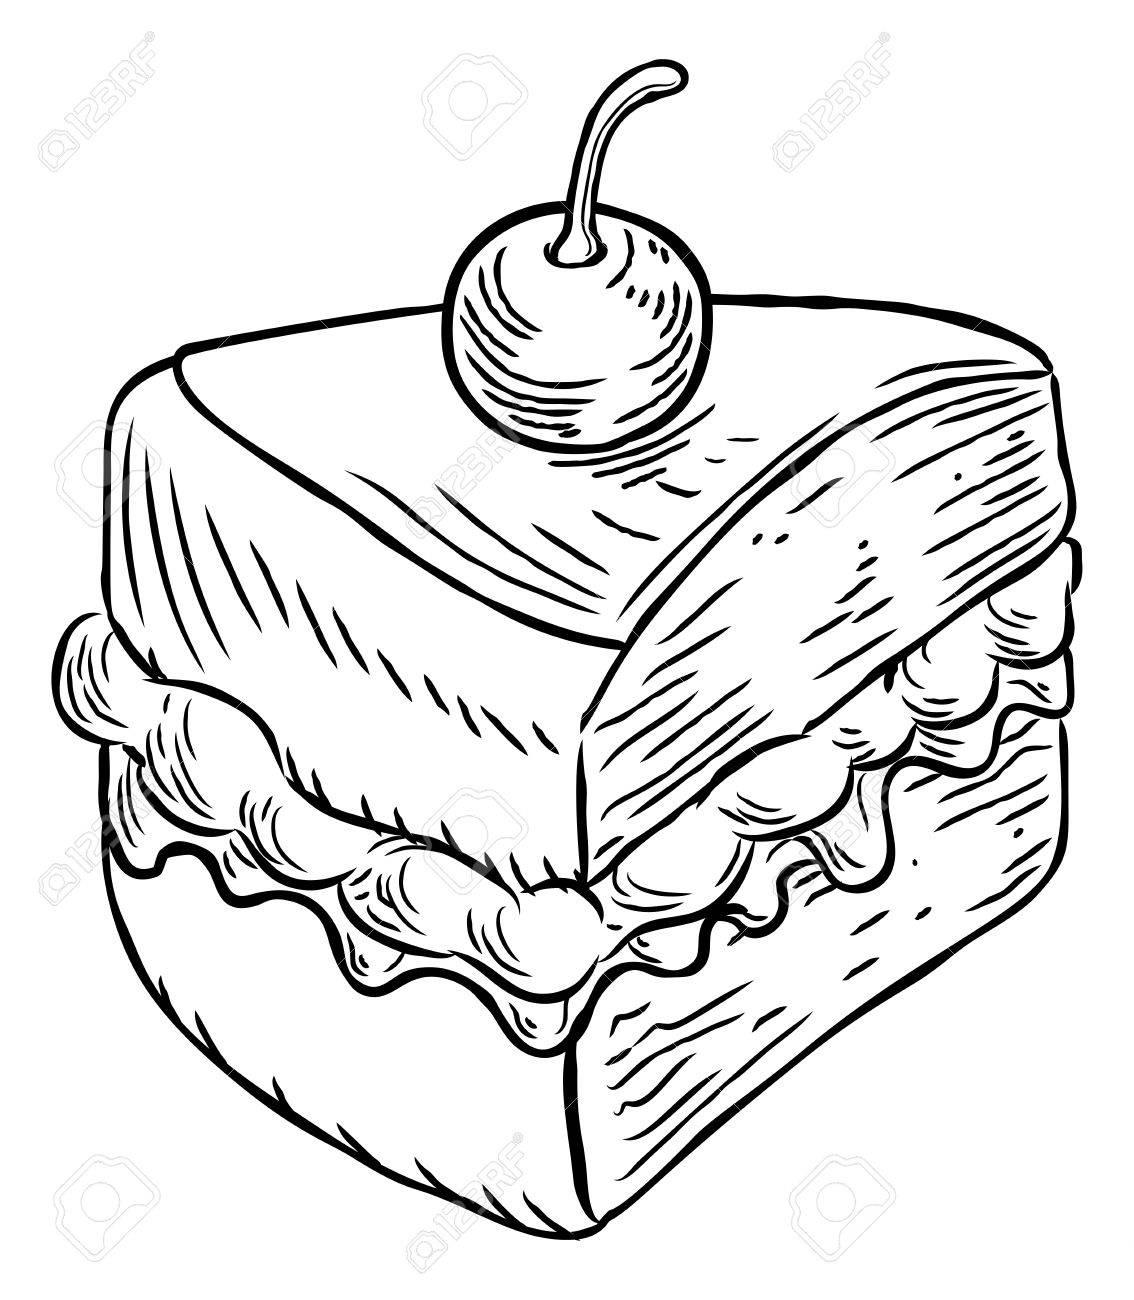 1134x1300 A Jam And Cream Victoria Sponge Cake Slice With Cherry, Hand